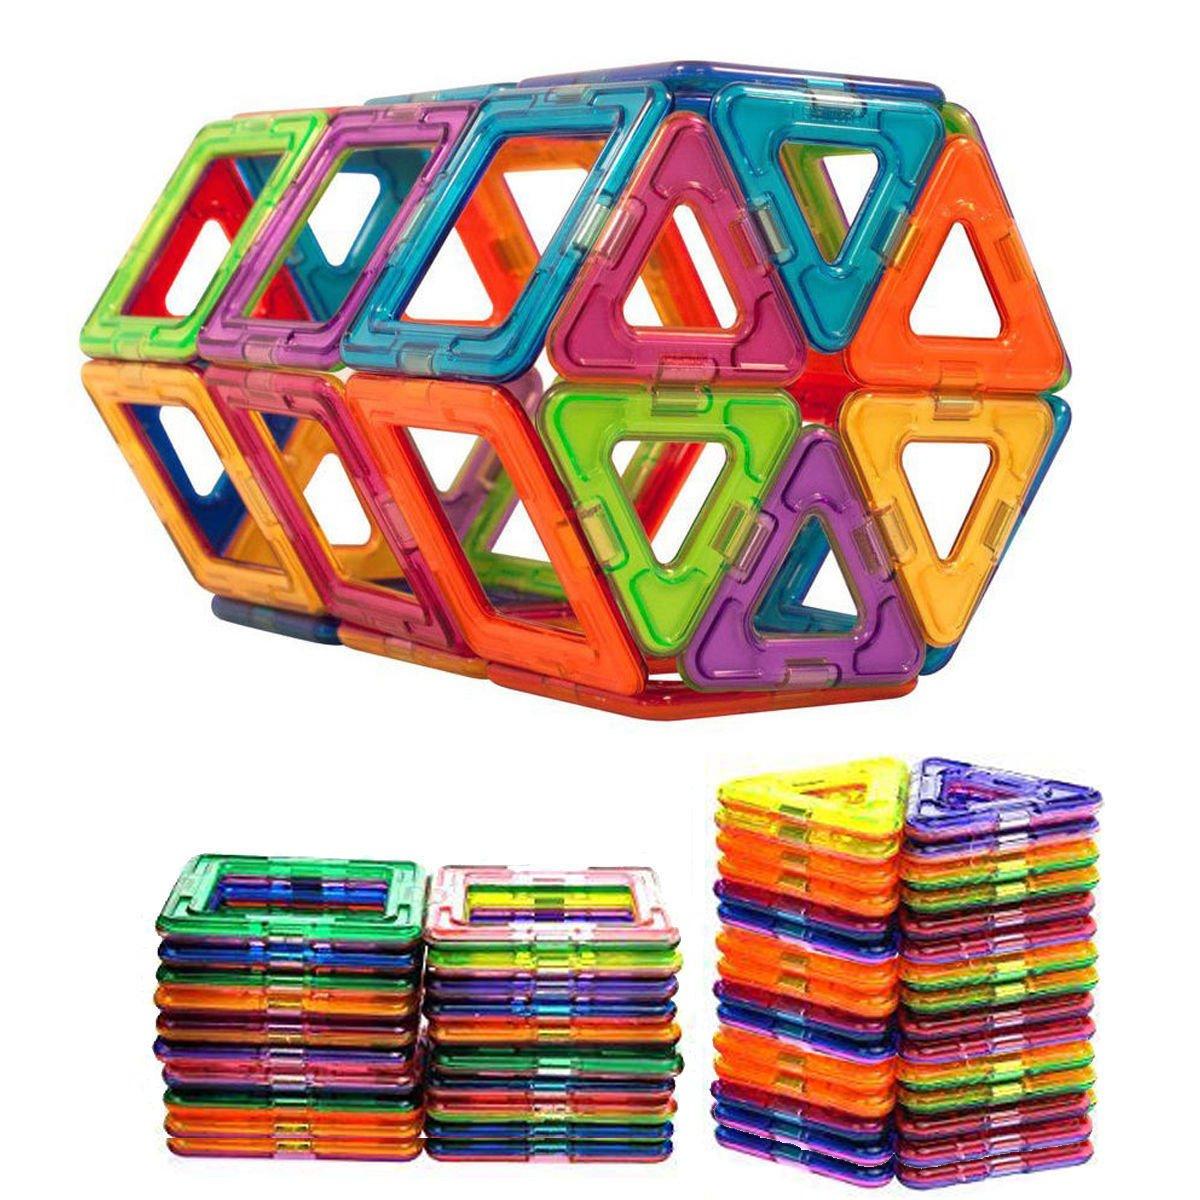 Vomy 50個磁気Construction Buildingブロック子供おもちゃ教育ブロックキッズ B07CWV4ZCS